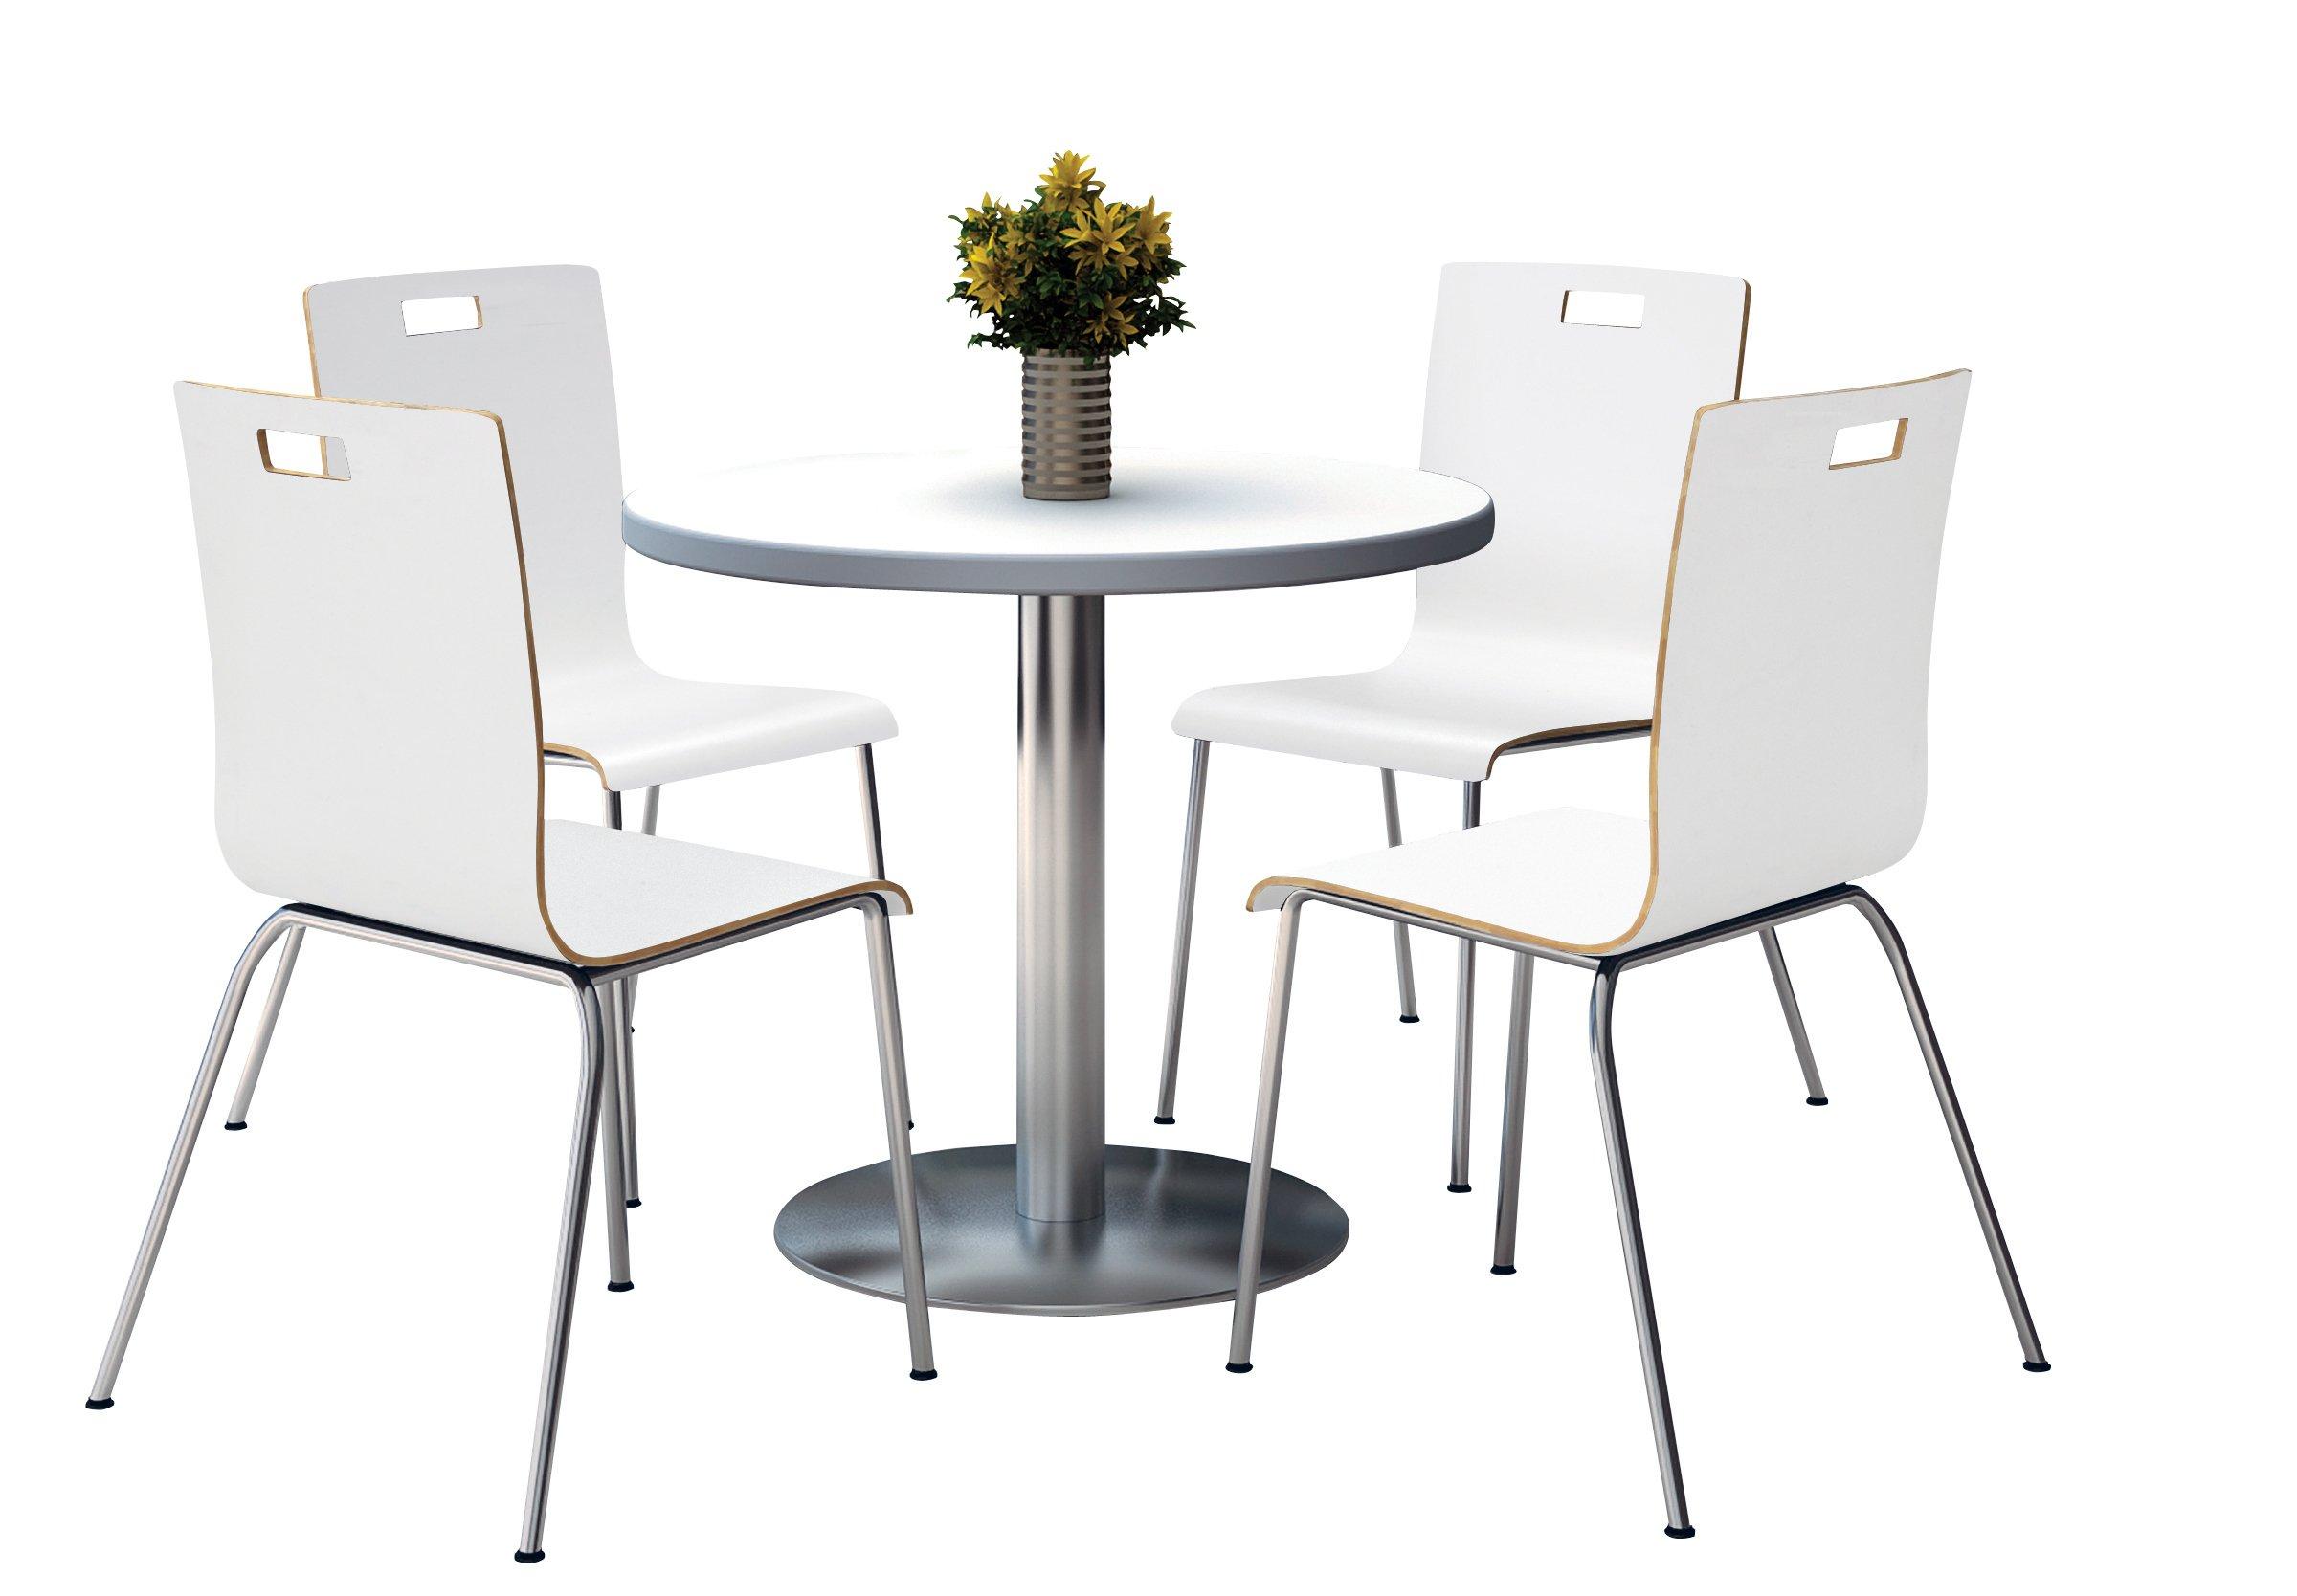 KFI Seating Round Laminate Top Pedestal Table with 4 White Stacking Bentwood Chairs, 36'' Diameter, Crisp Linen